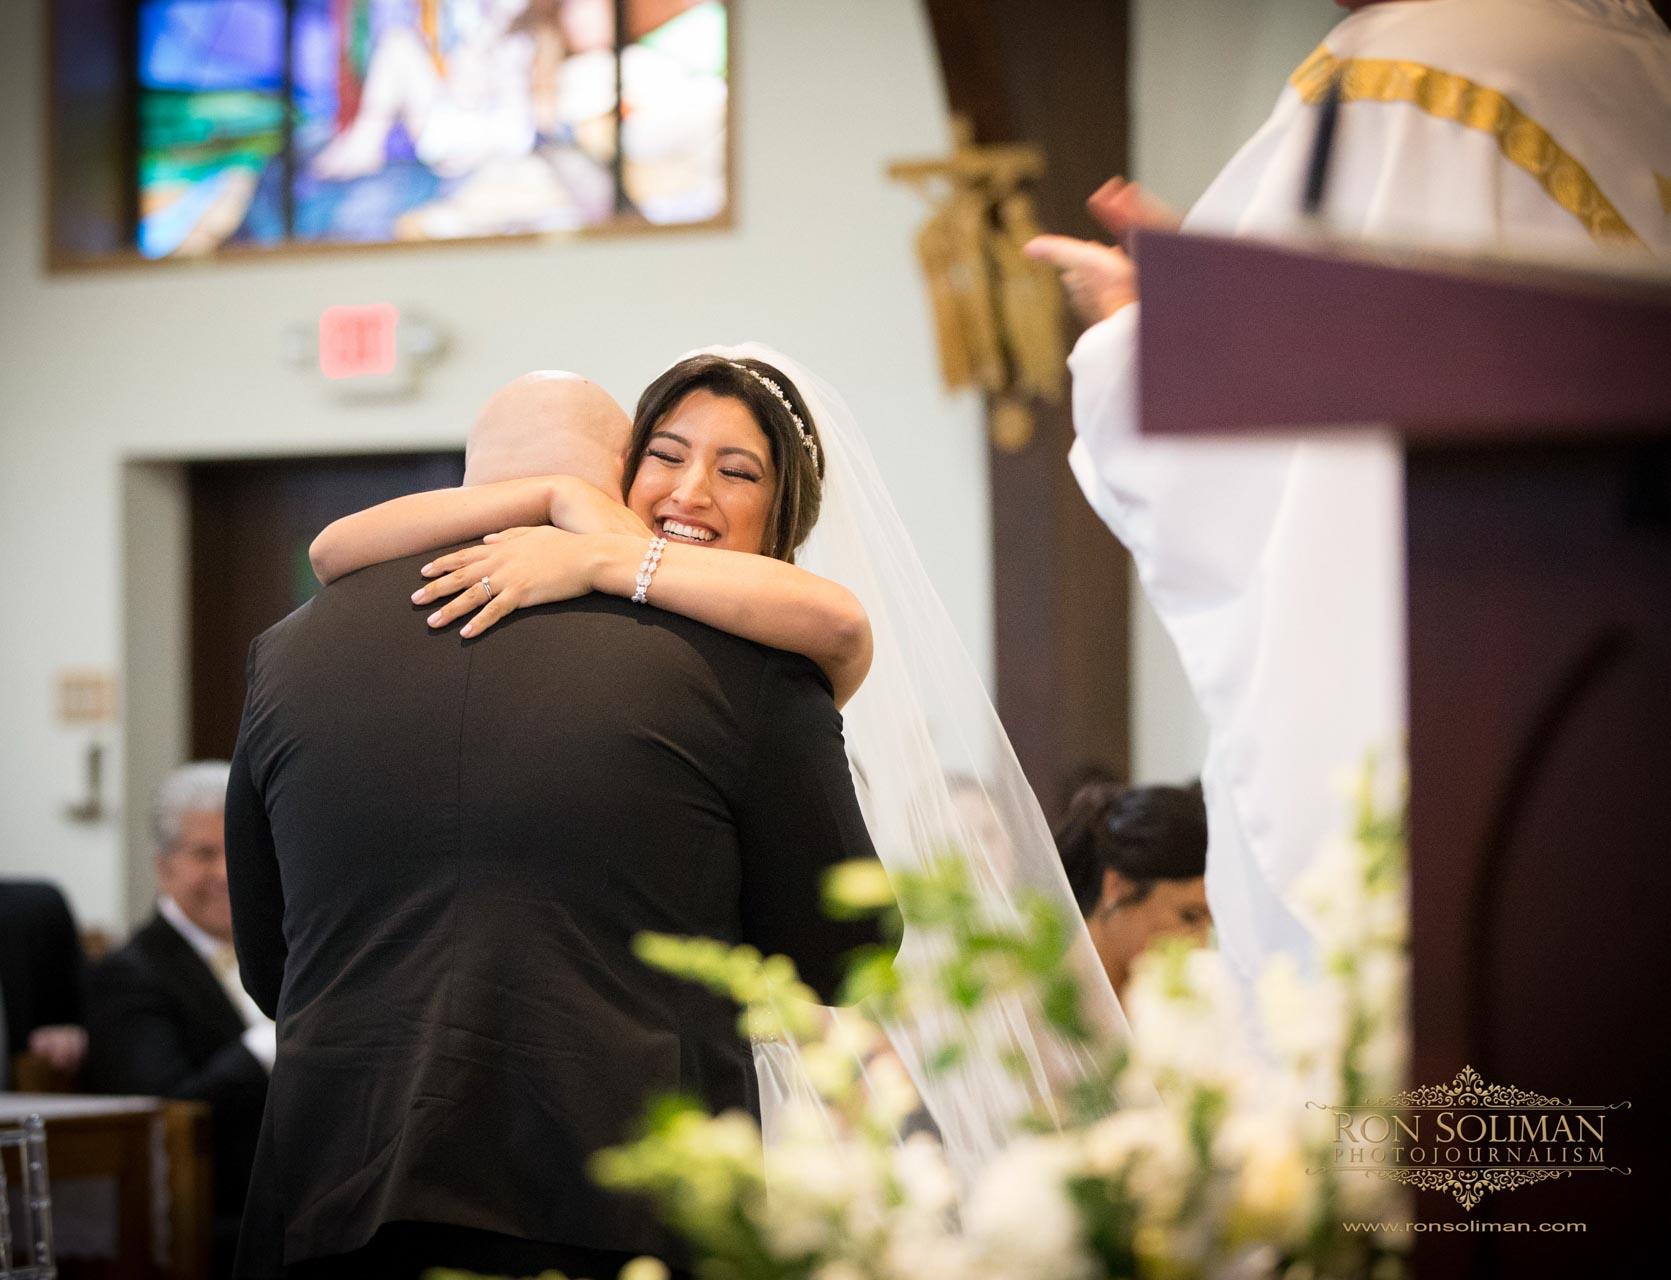 THE MERION WEDDING 18